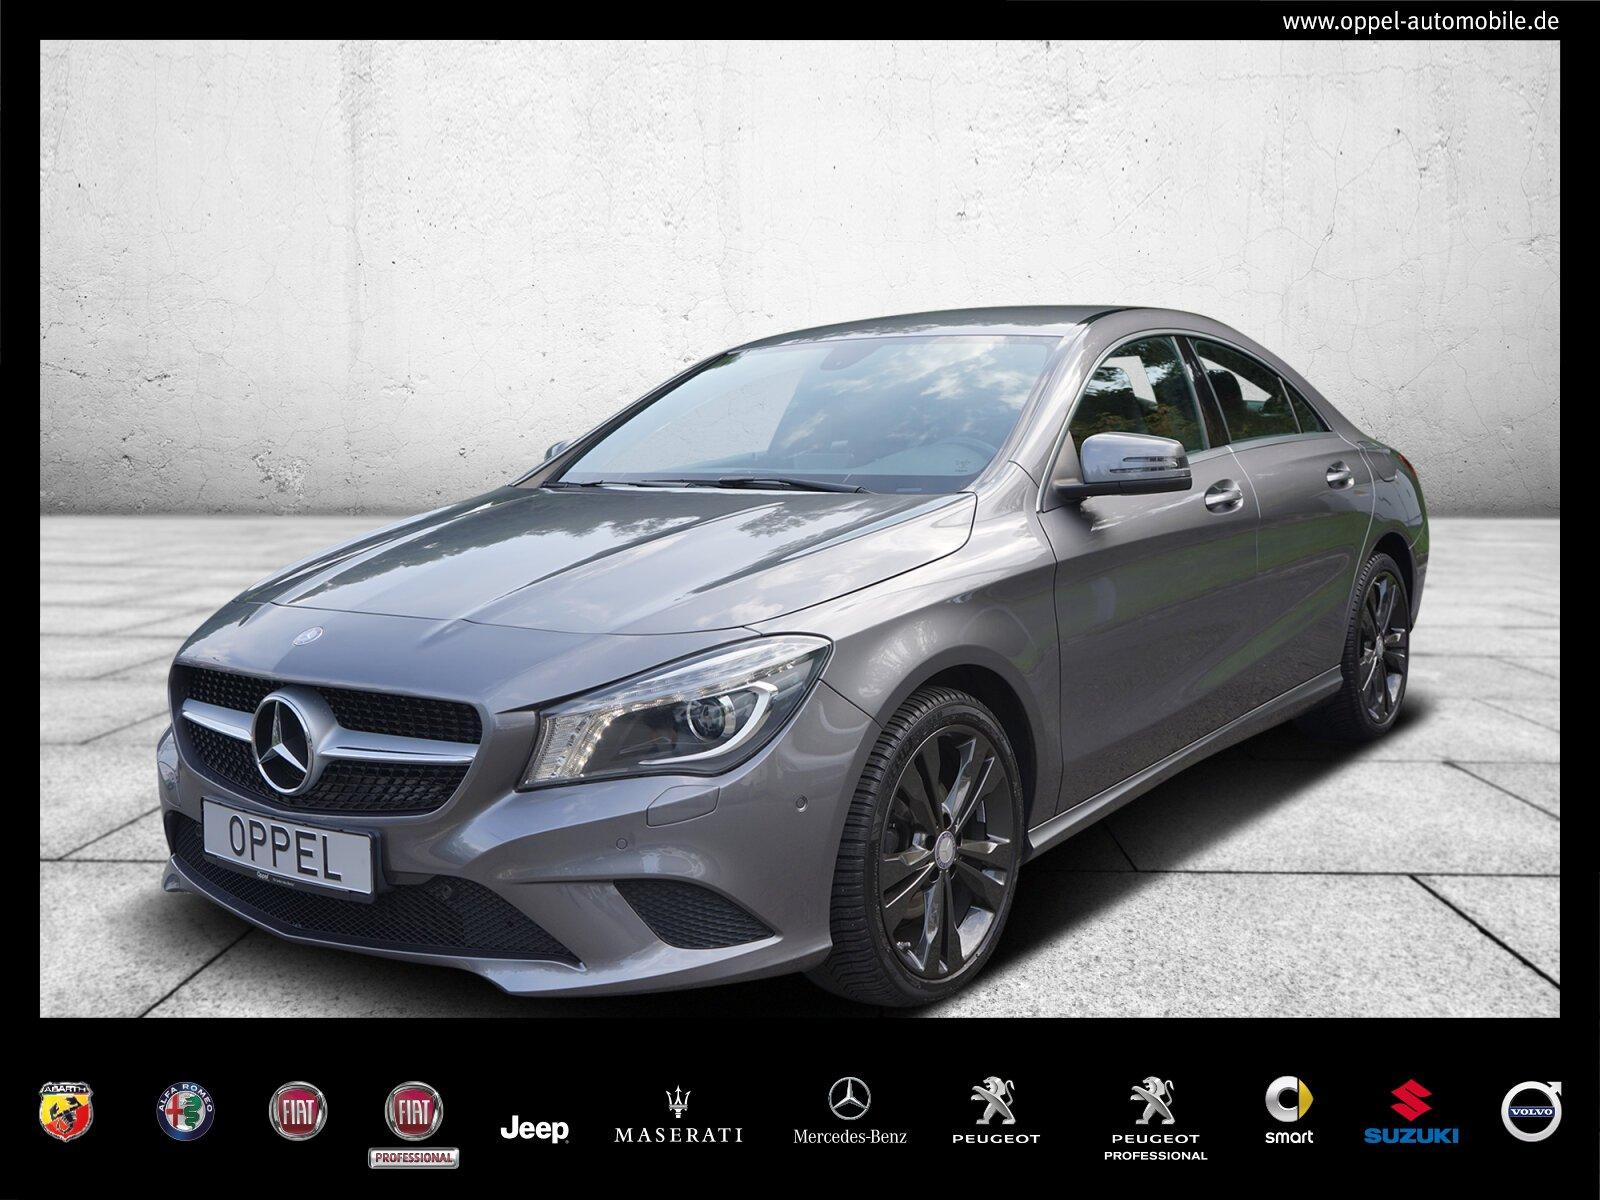 Mercedes-Benz CLA 180 Urban NAVI+KLIMA+AUTOMATIK+XENON+SITZH.+, Jahr 2014, Benzin